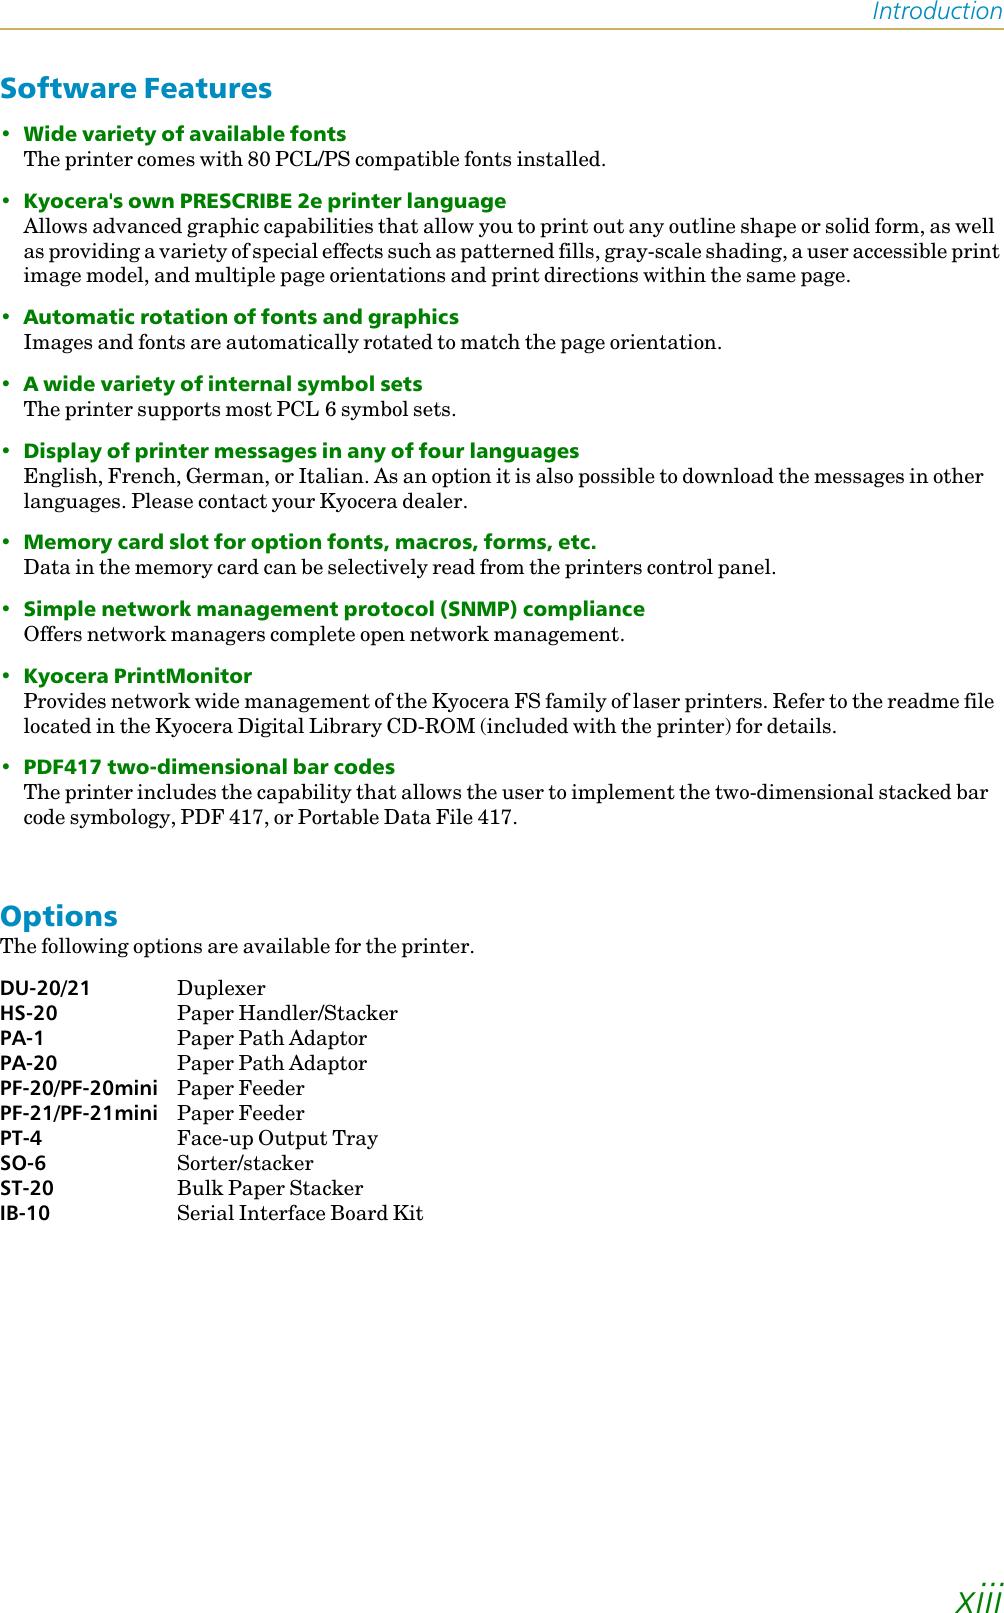 Kyocera Fs 1200 Users Manual